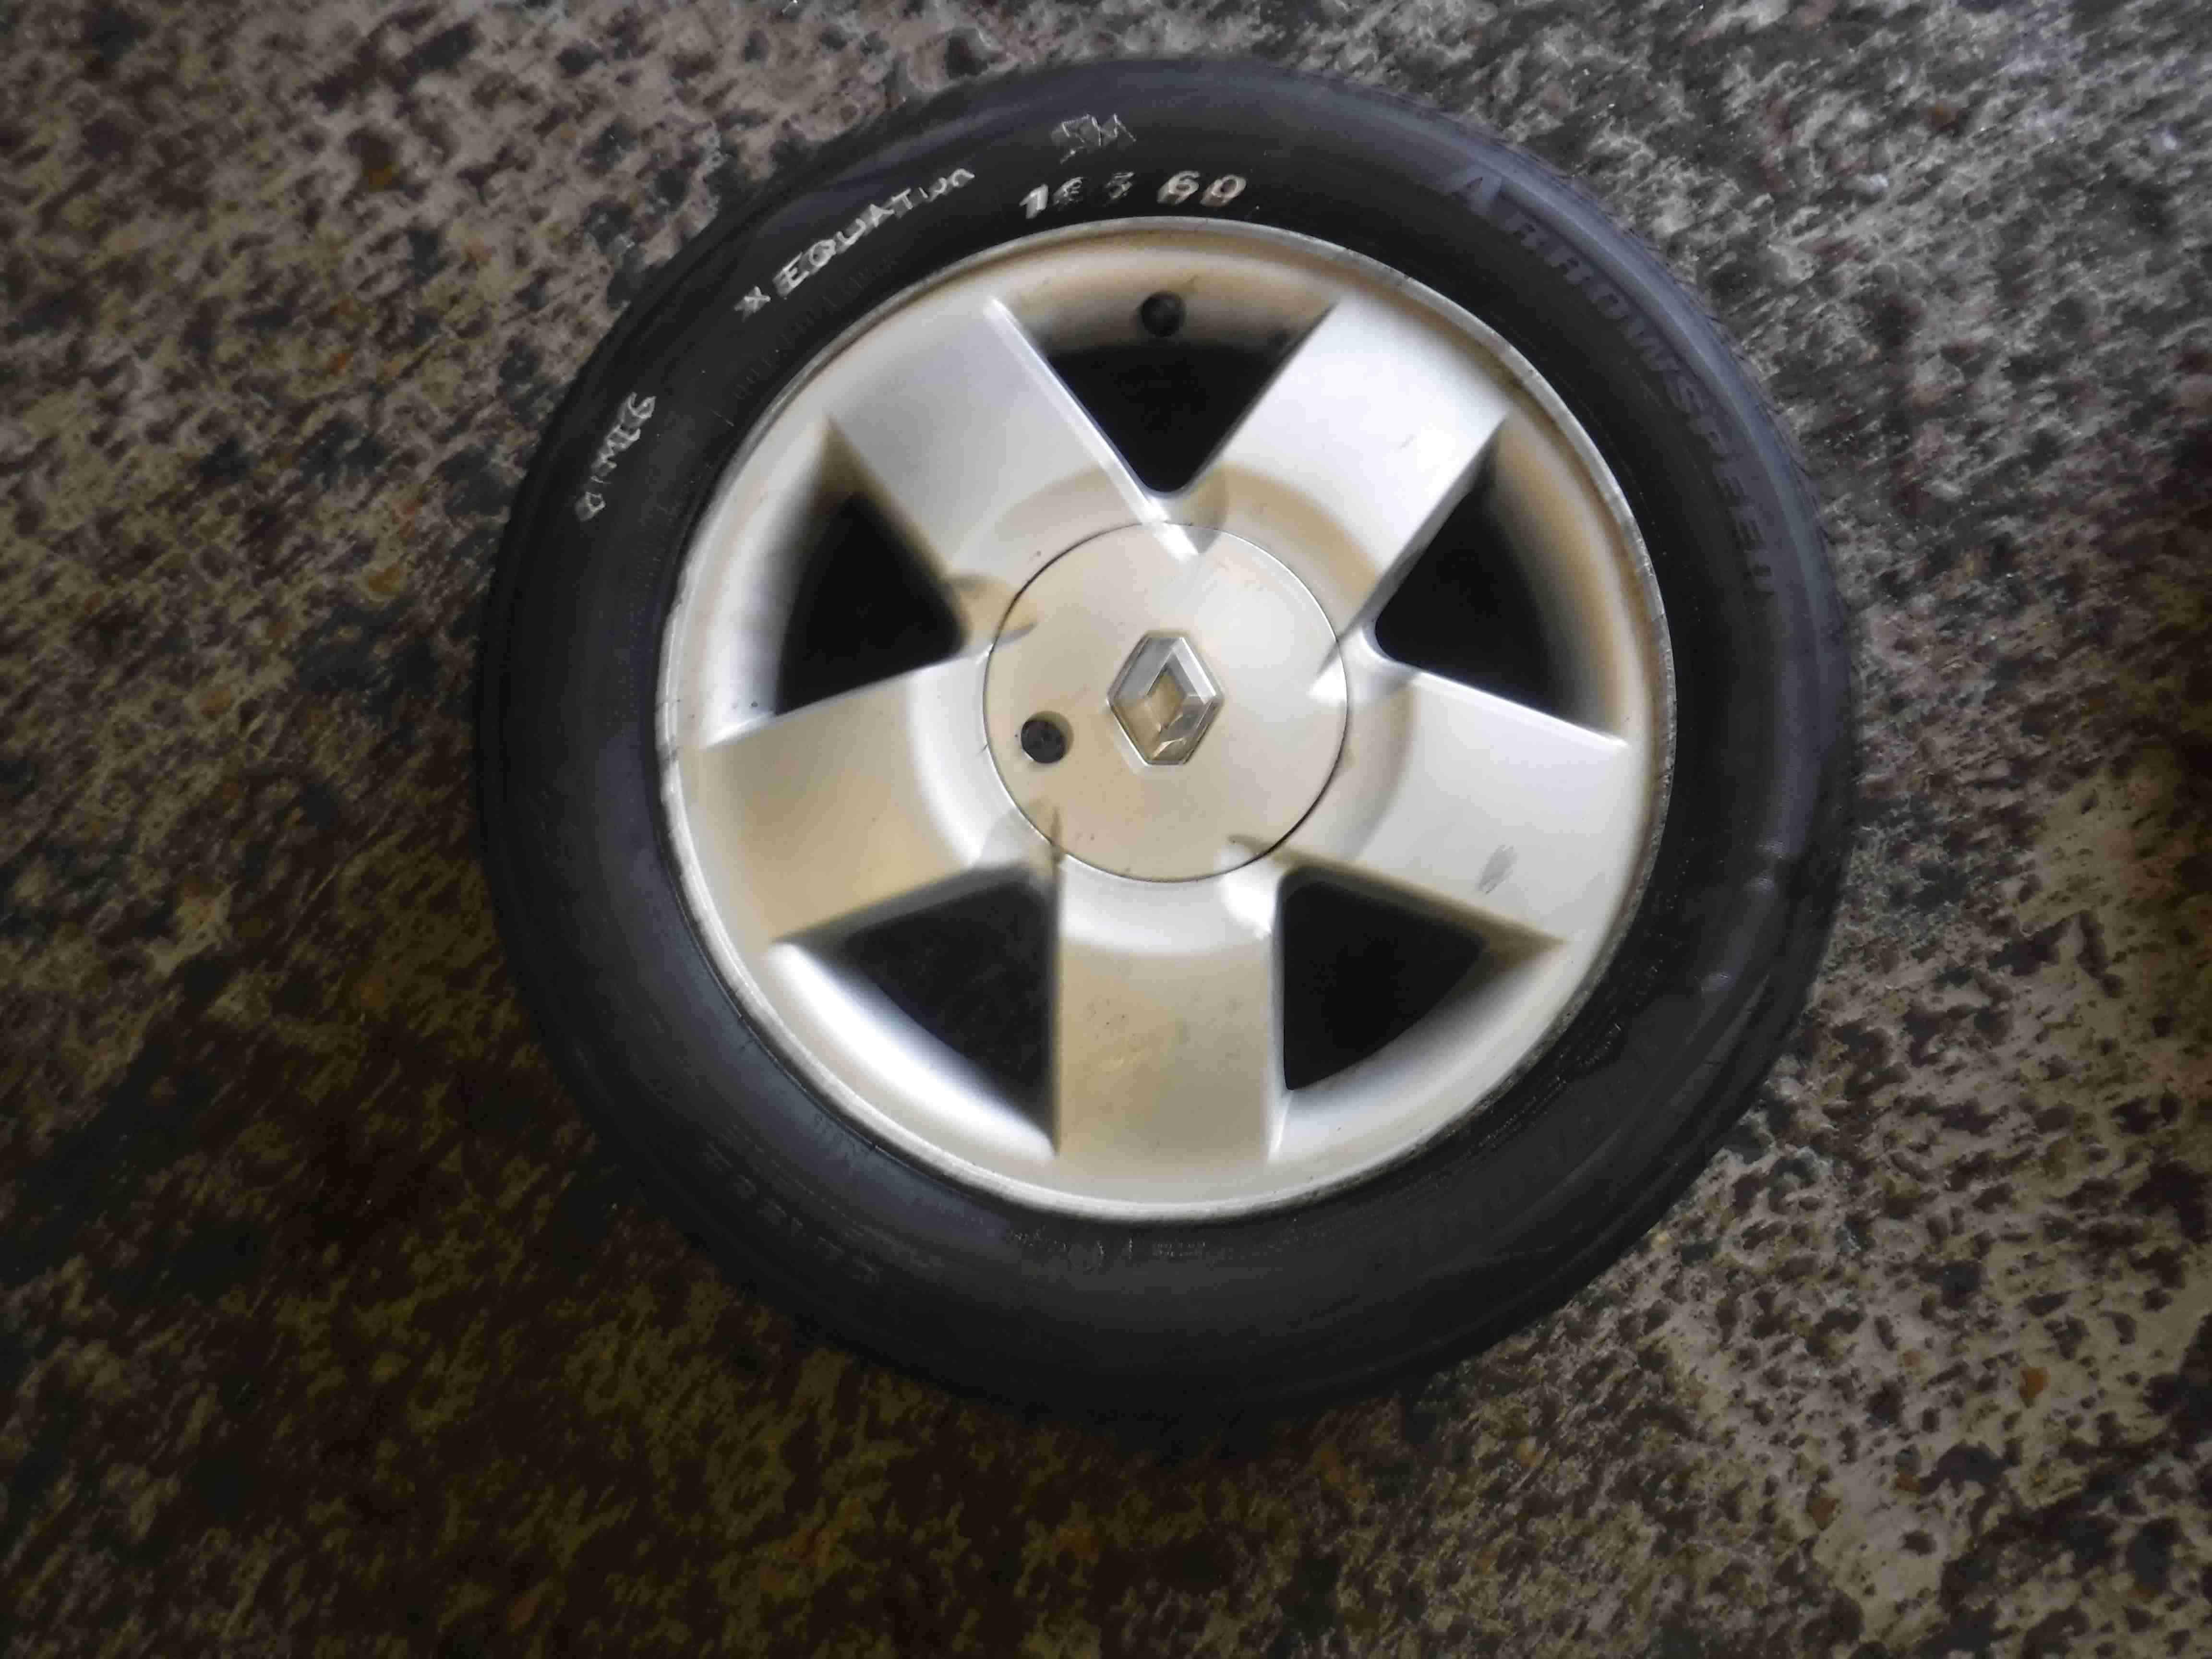 Renault Megane 1999-2002 Equation Alloy Wheel 15inch 4/5